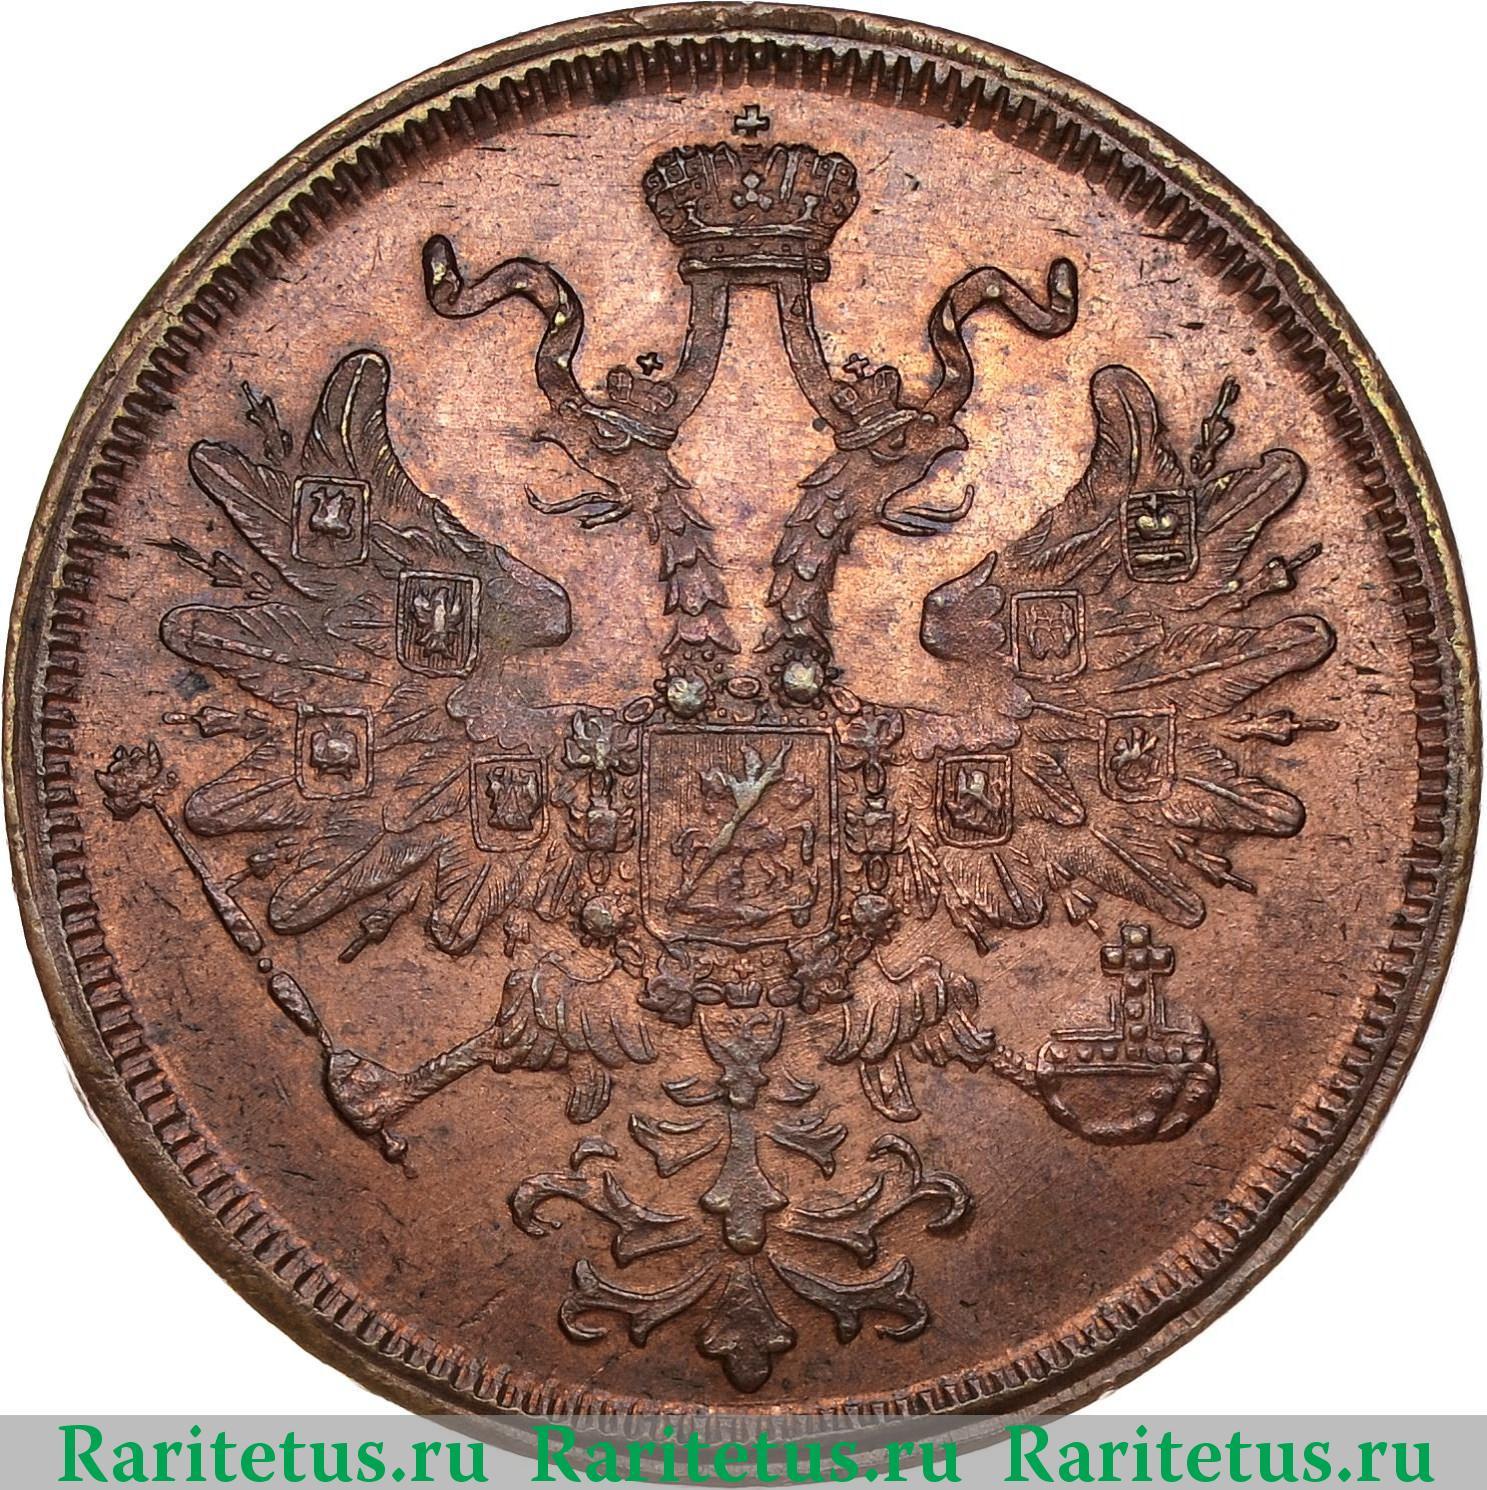 Аверс монеты 5 копеек 1866 года ЕМ